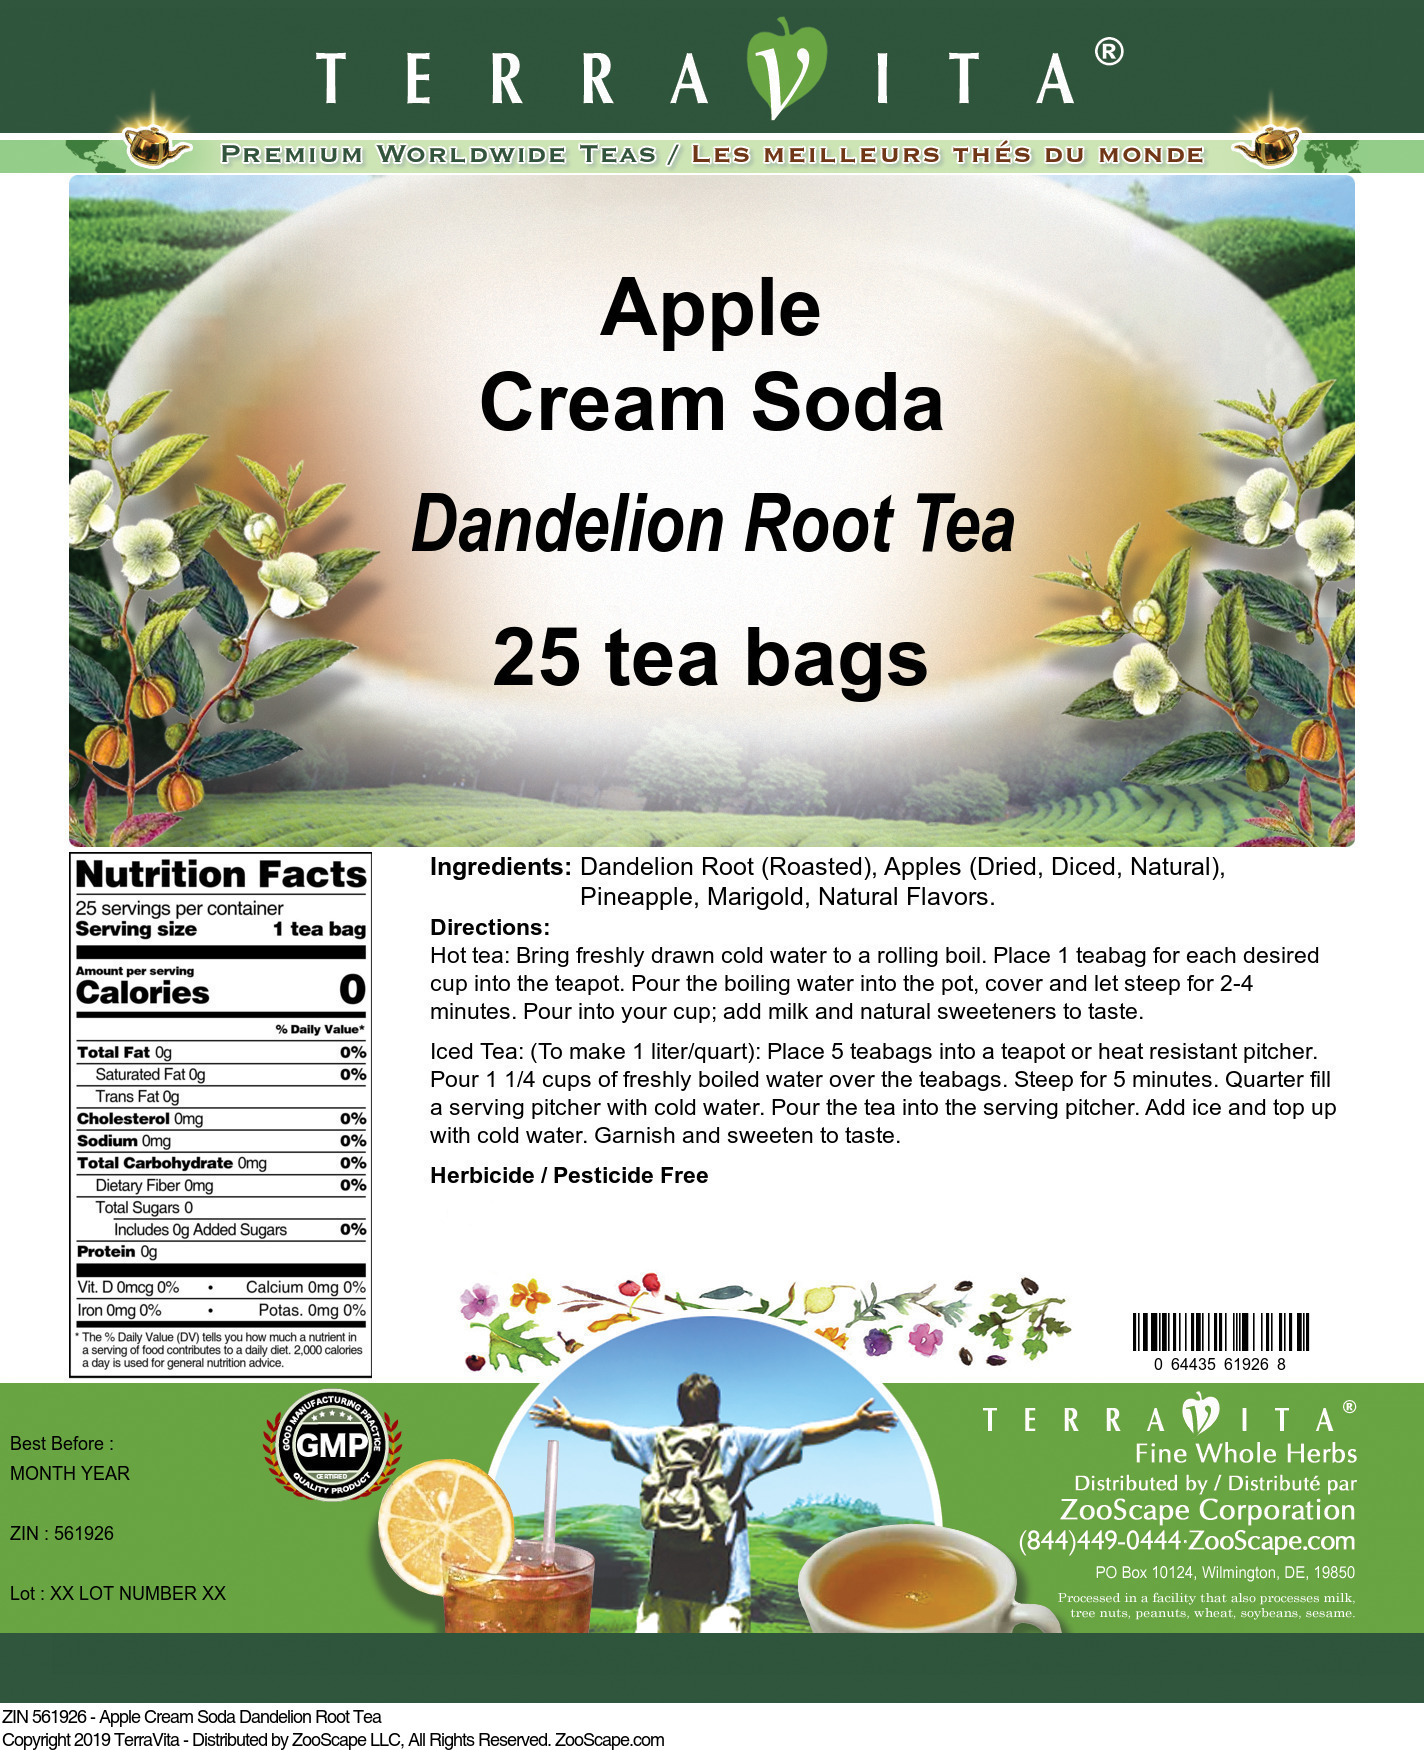 Apple Cream Soda Dandelion Root